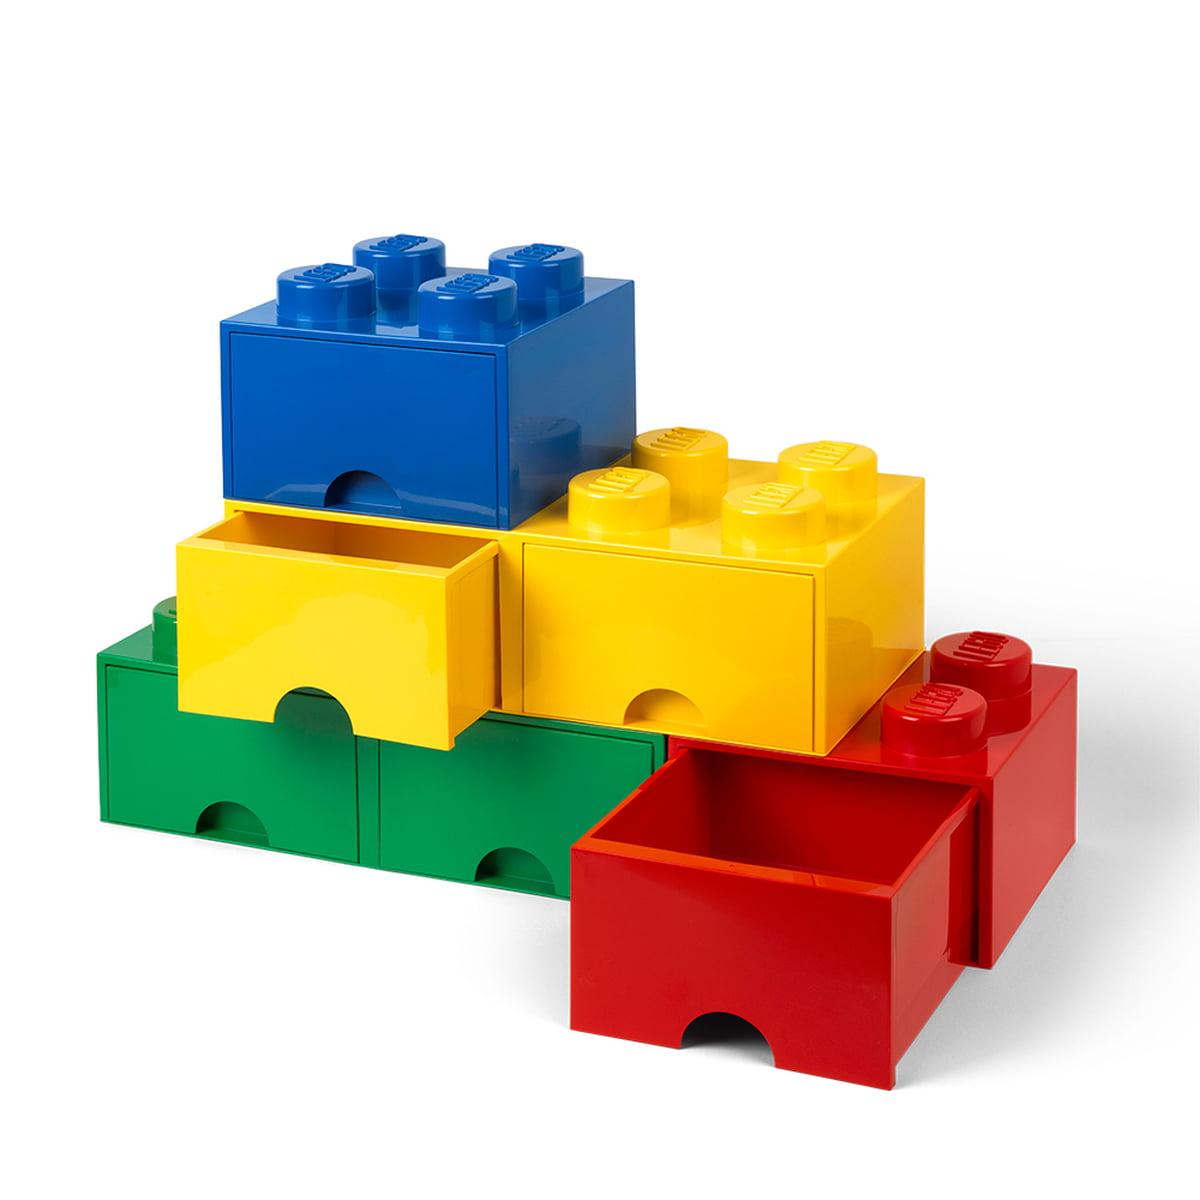 brick drawer 8 by lego connox. Black Bedroom Furniture Sets. Home Design Ideas